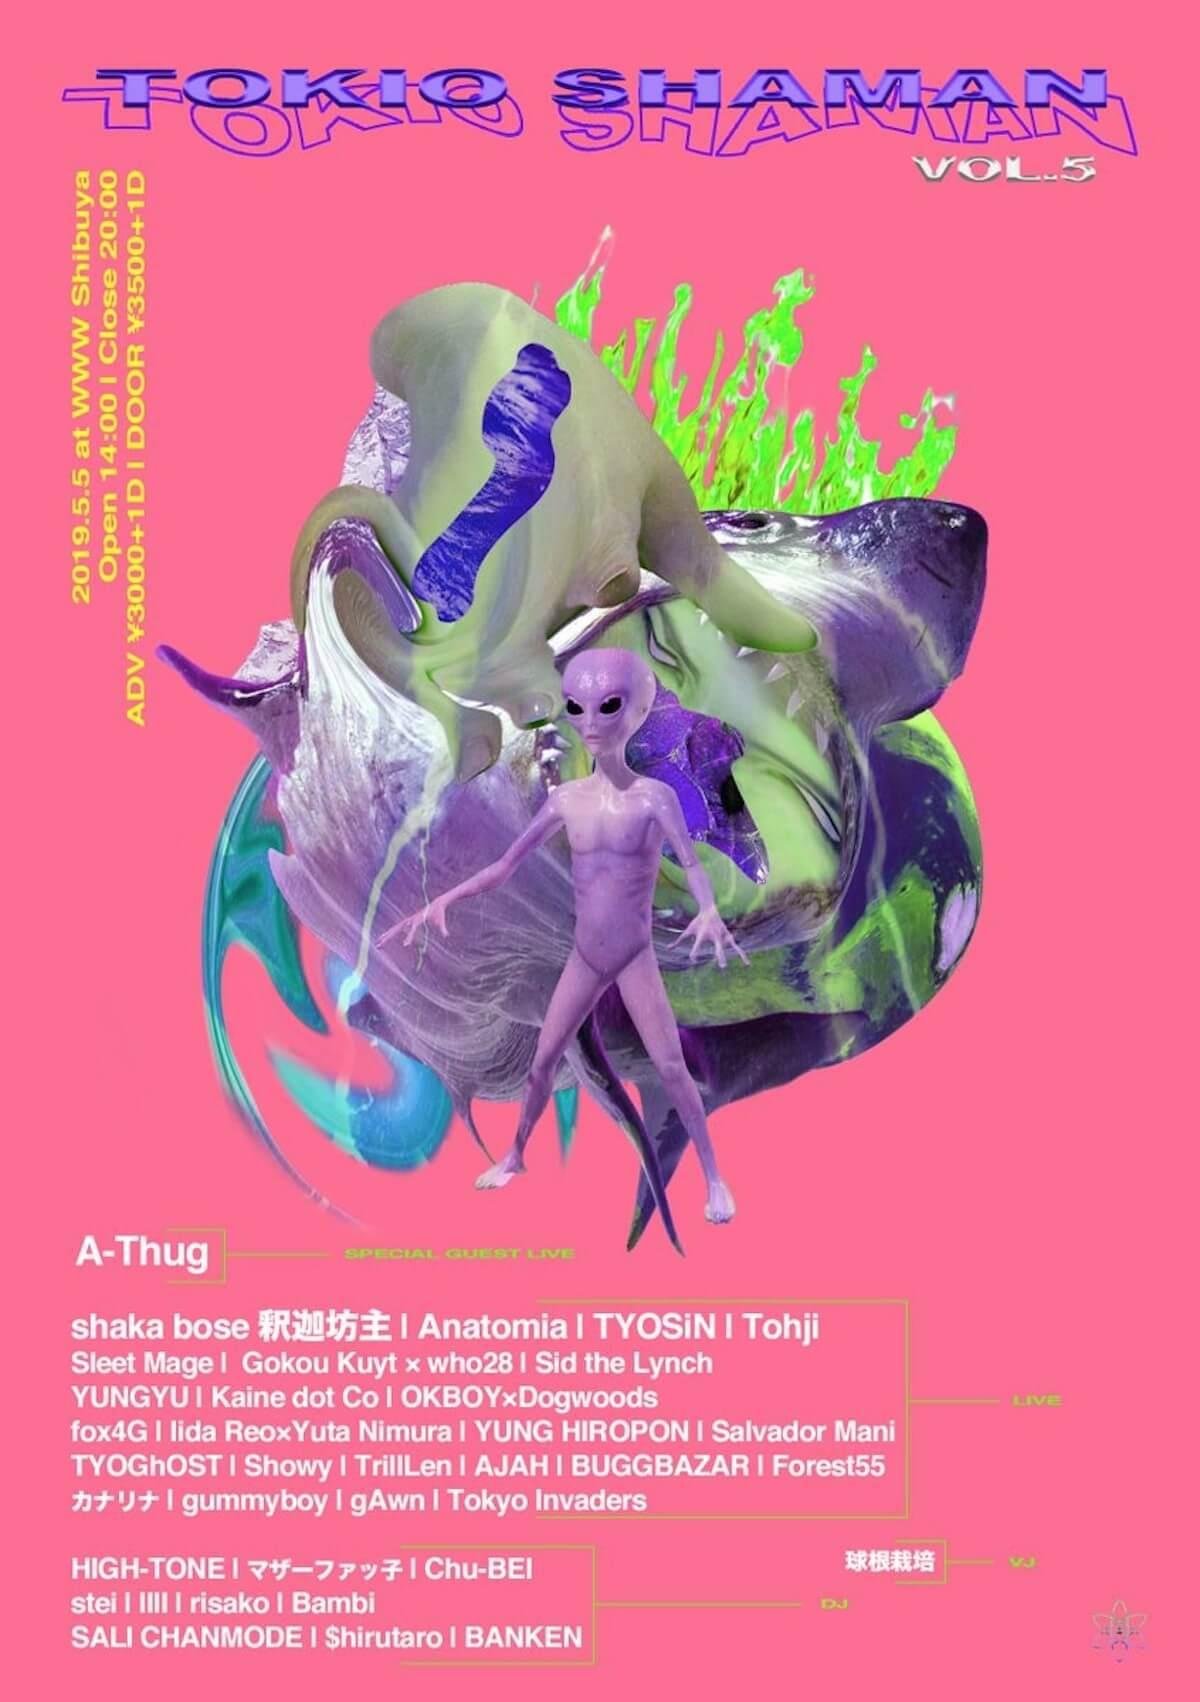 shaka bose 釈迦坊主「TOKIO SHAMAN vol.5」のタイムテーブルが公開&アフターパーティーが本日EBISU BATICAにて急遽開催決定 music190505-tokio-shaman-1